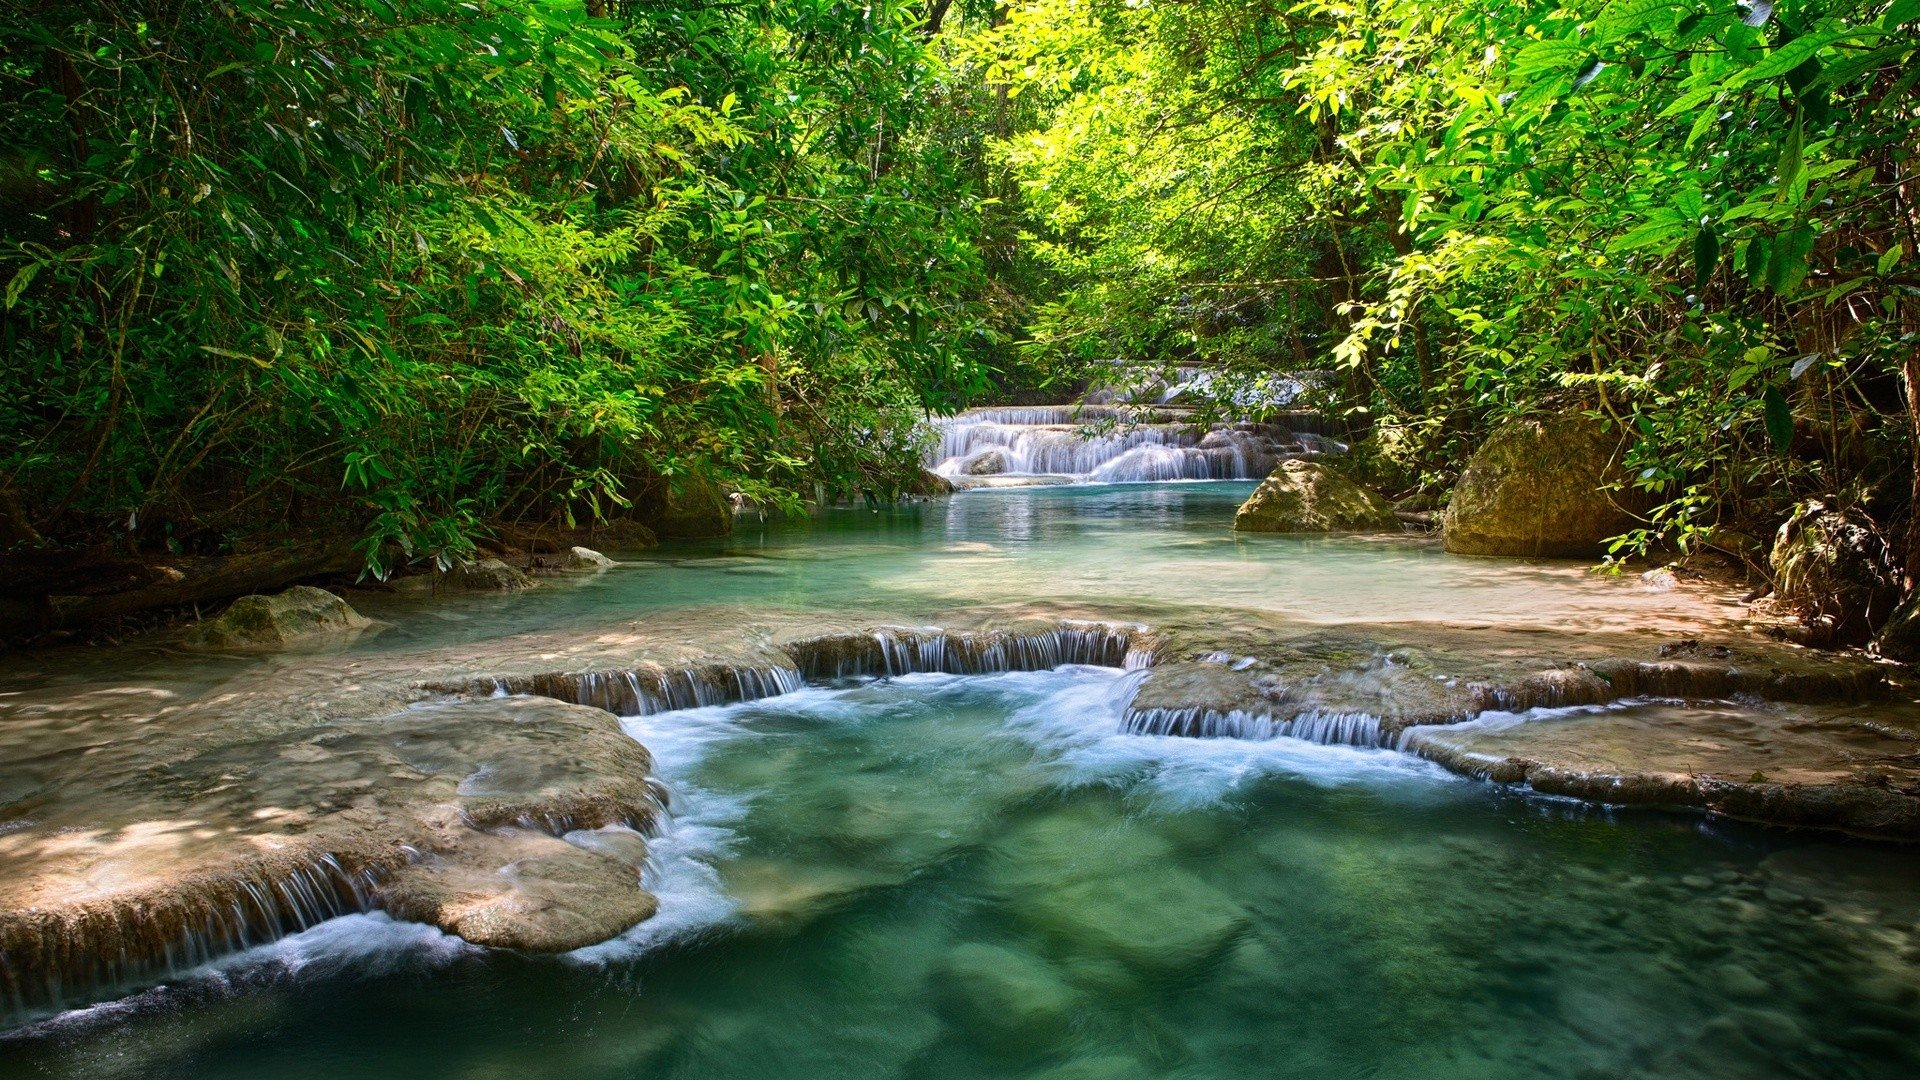 Mountain river with small rapids HD Desktop Wallpaper HD Desktop 1920x1080